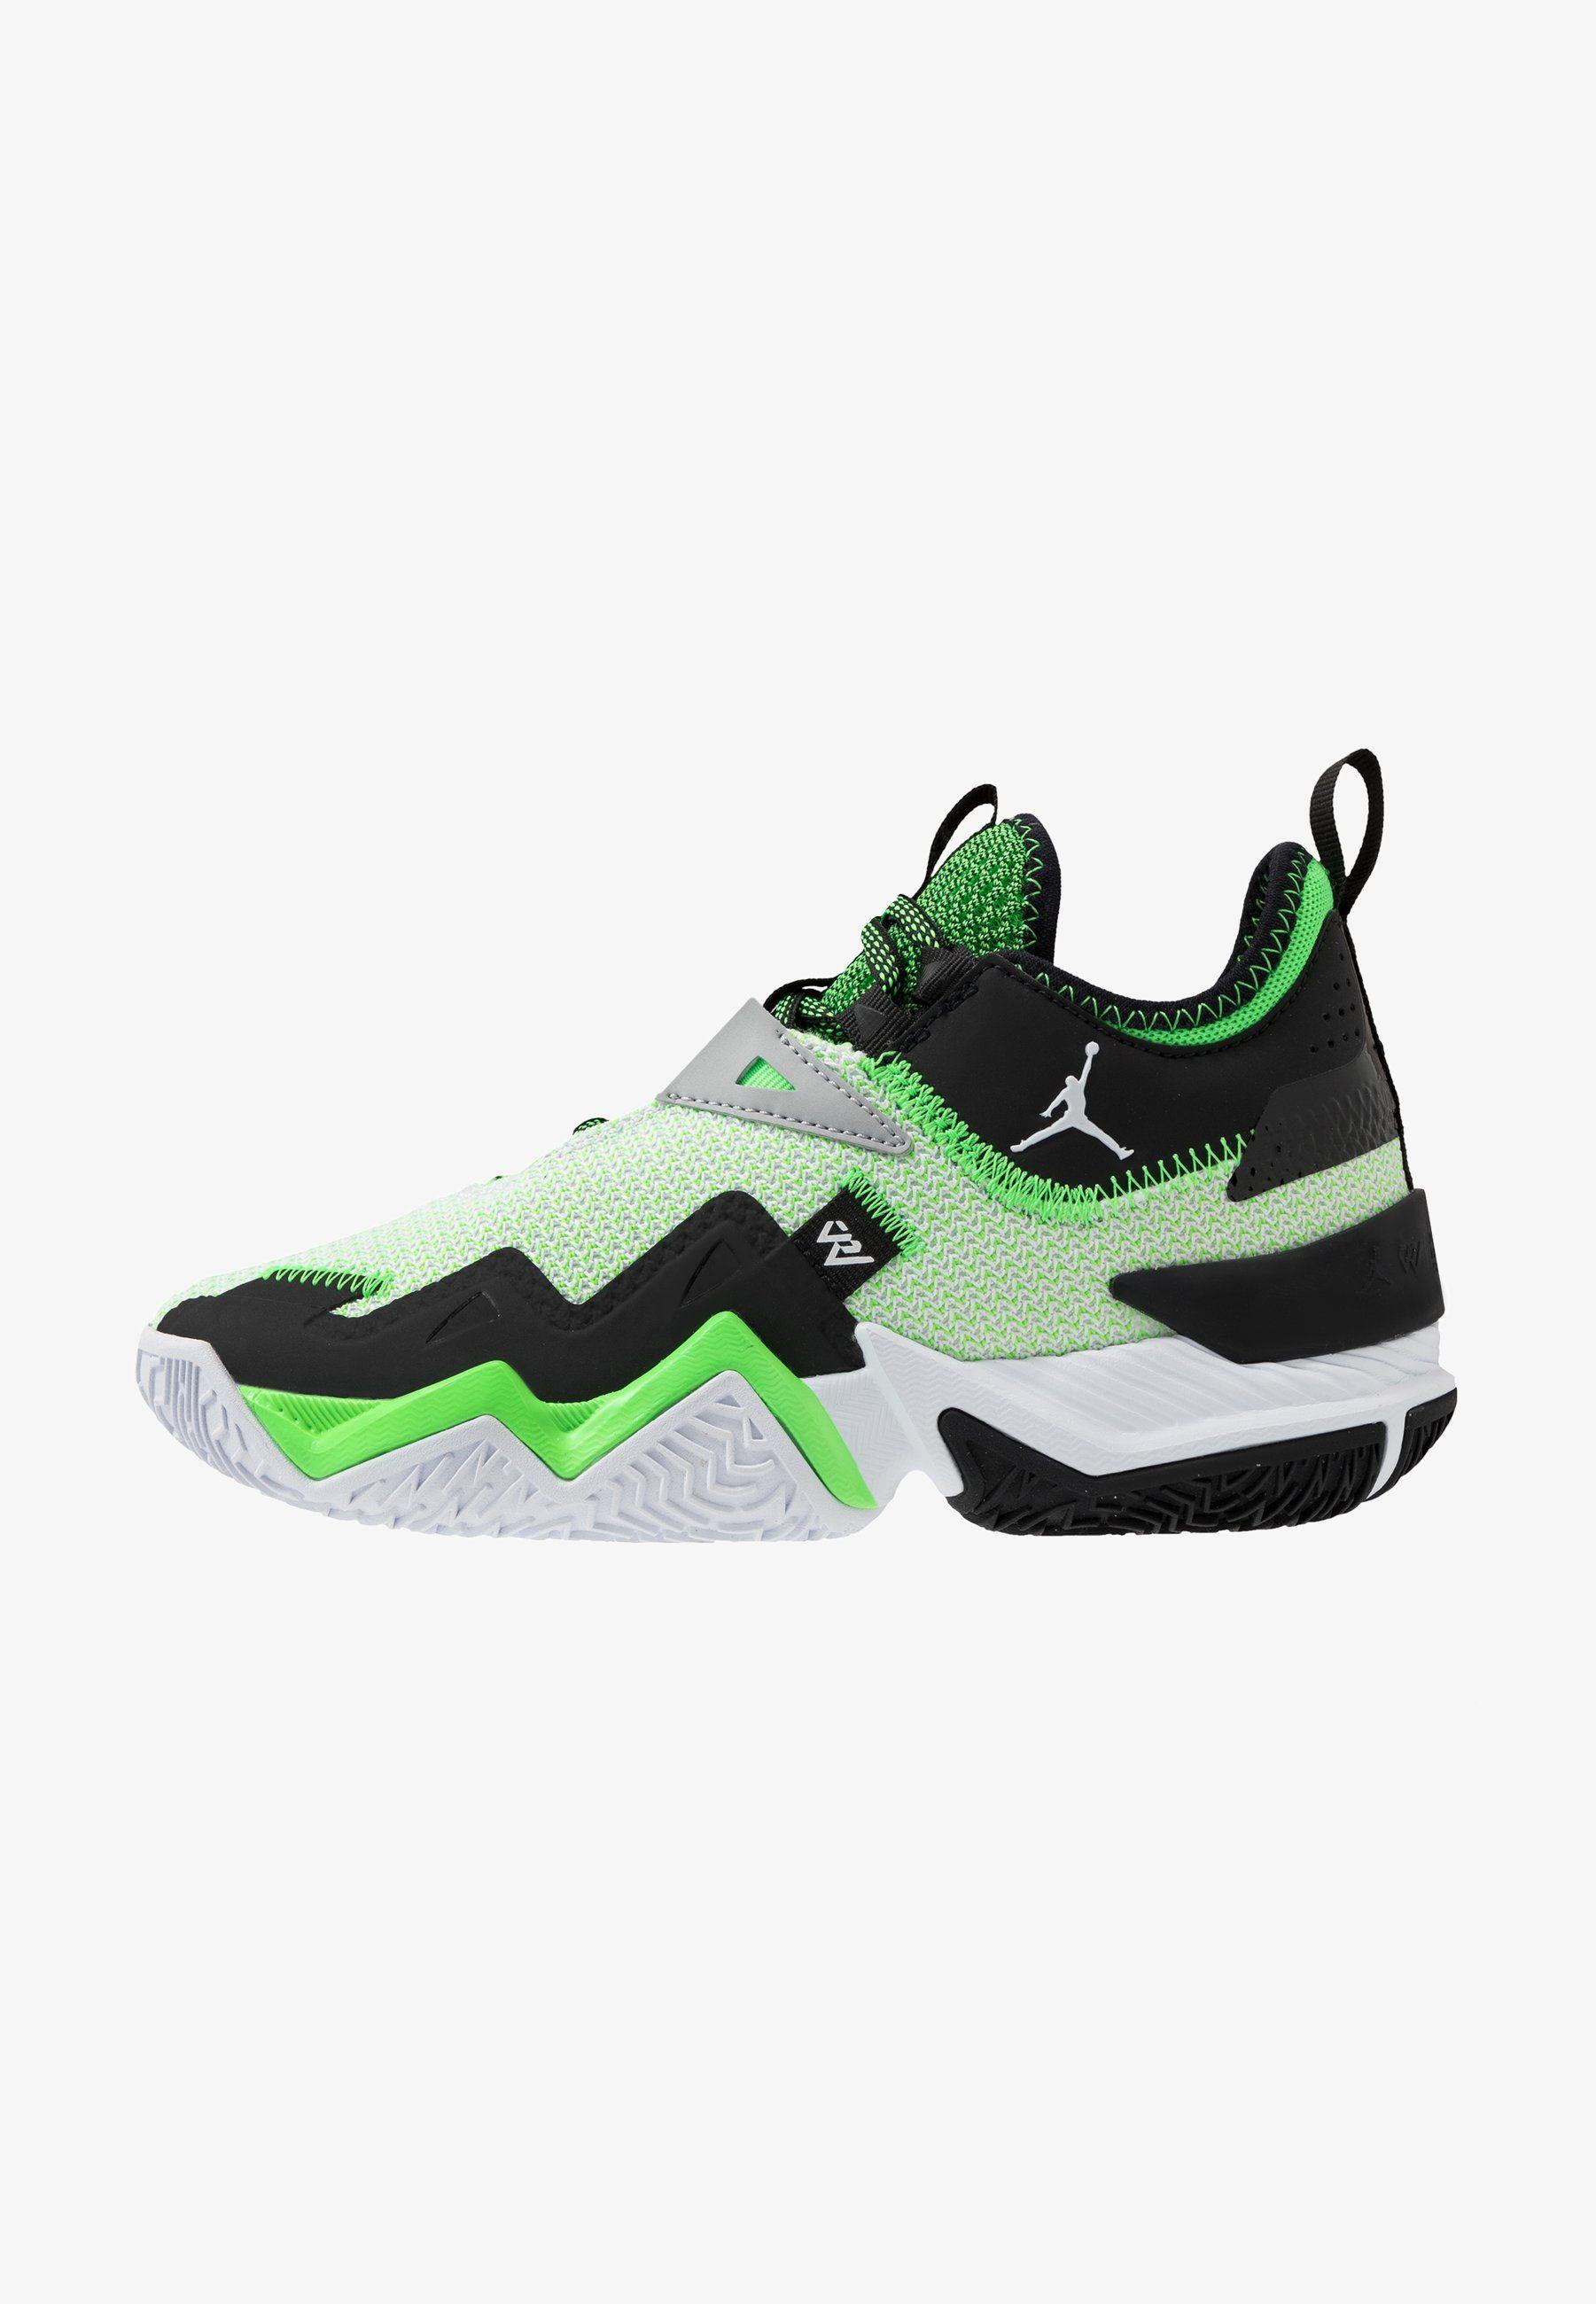 Jordan Westbrook One Take Unisex Obuwie Do Koszykowki White Black Rage Green Bialy Zalando Pl Sneakers Nike Shoes Sneakers